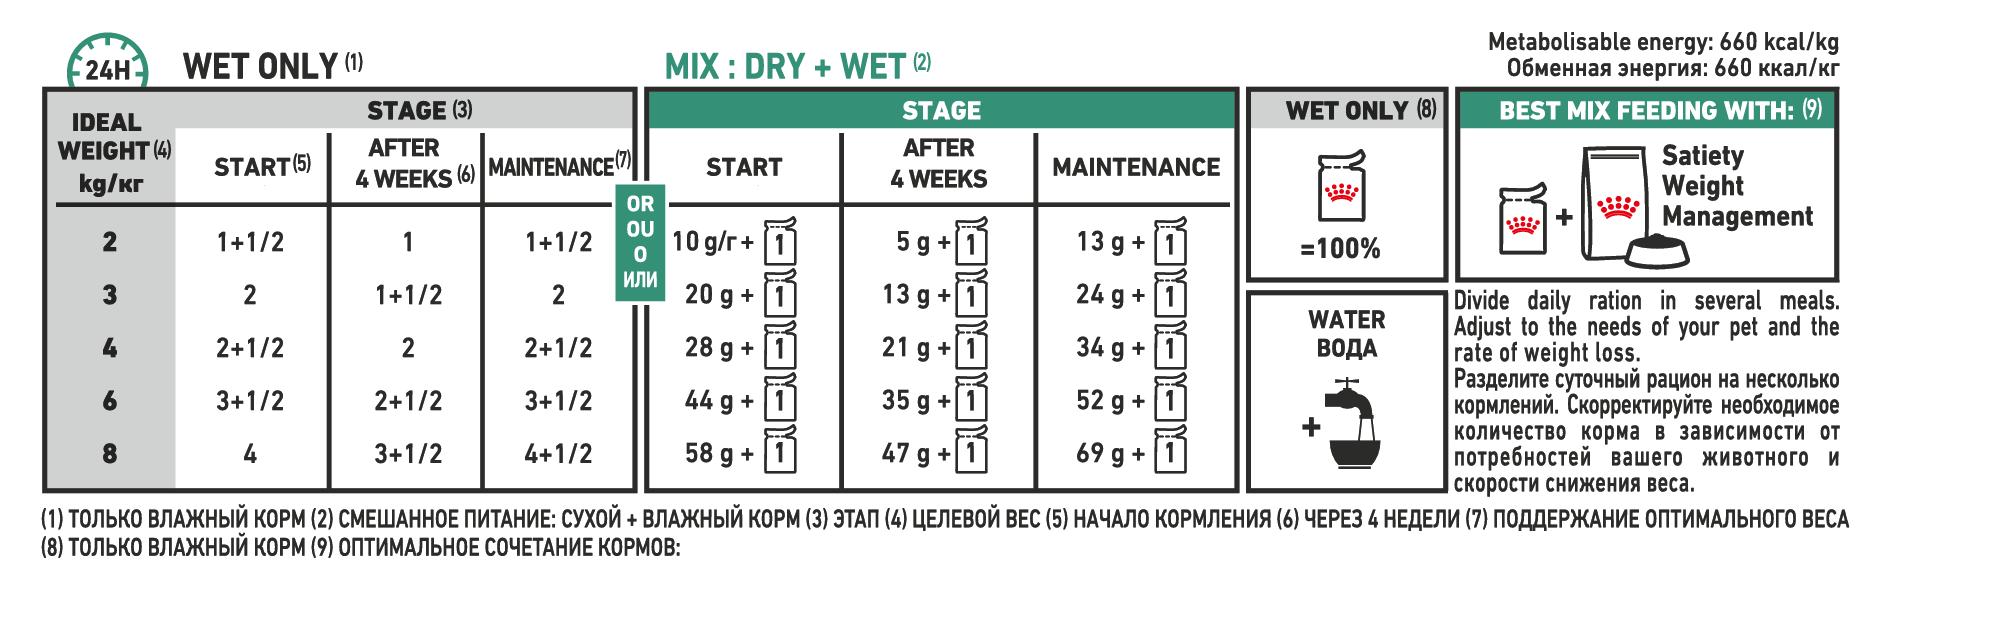 Satiety Weight Management (wet) feeding guide